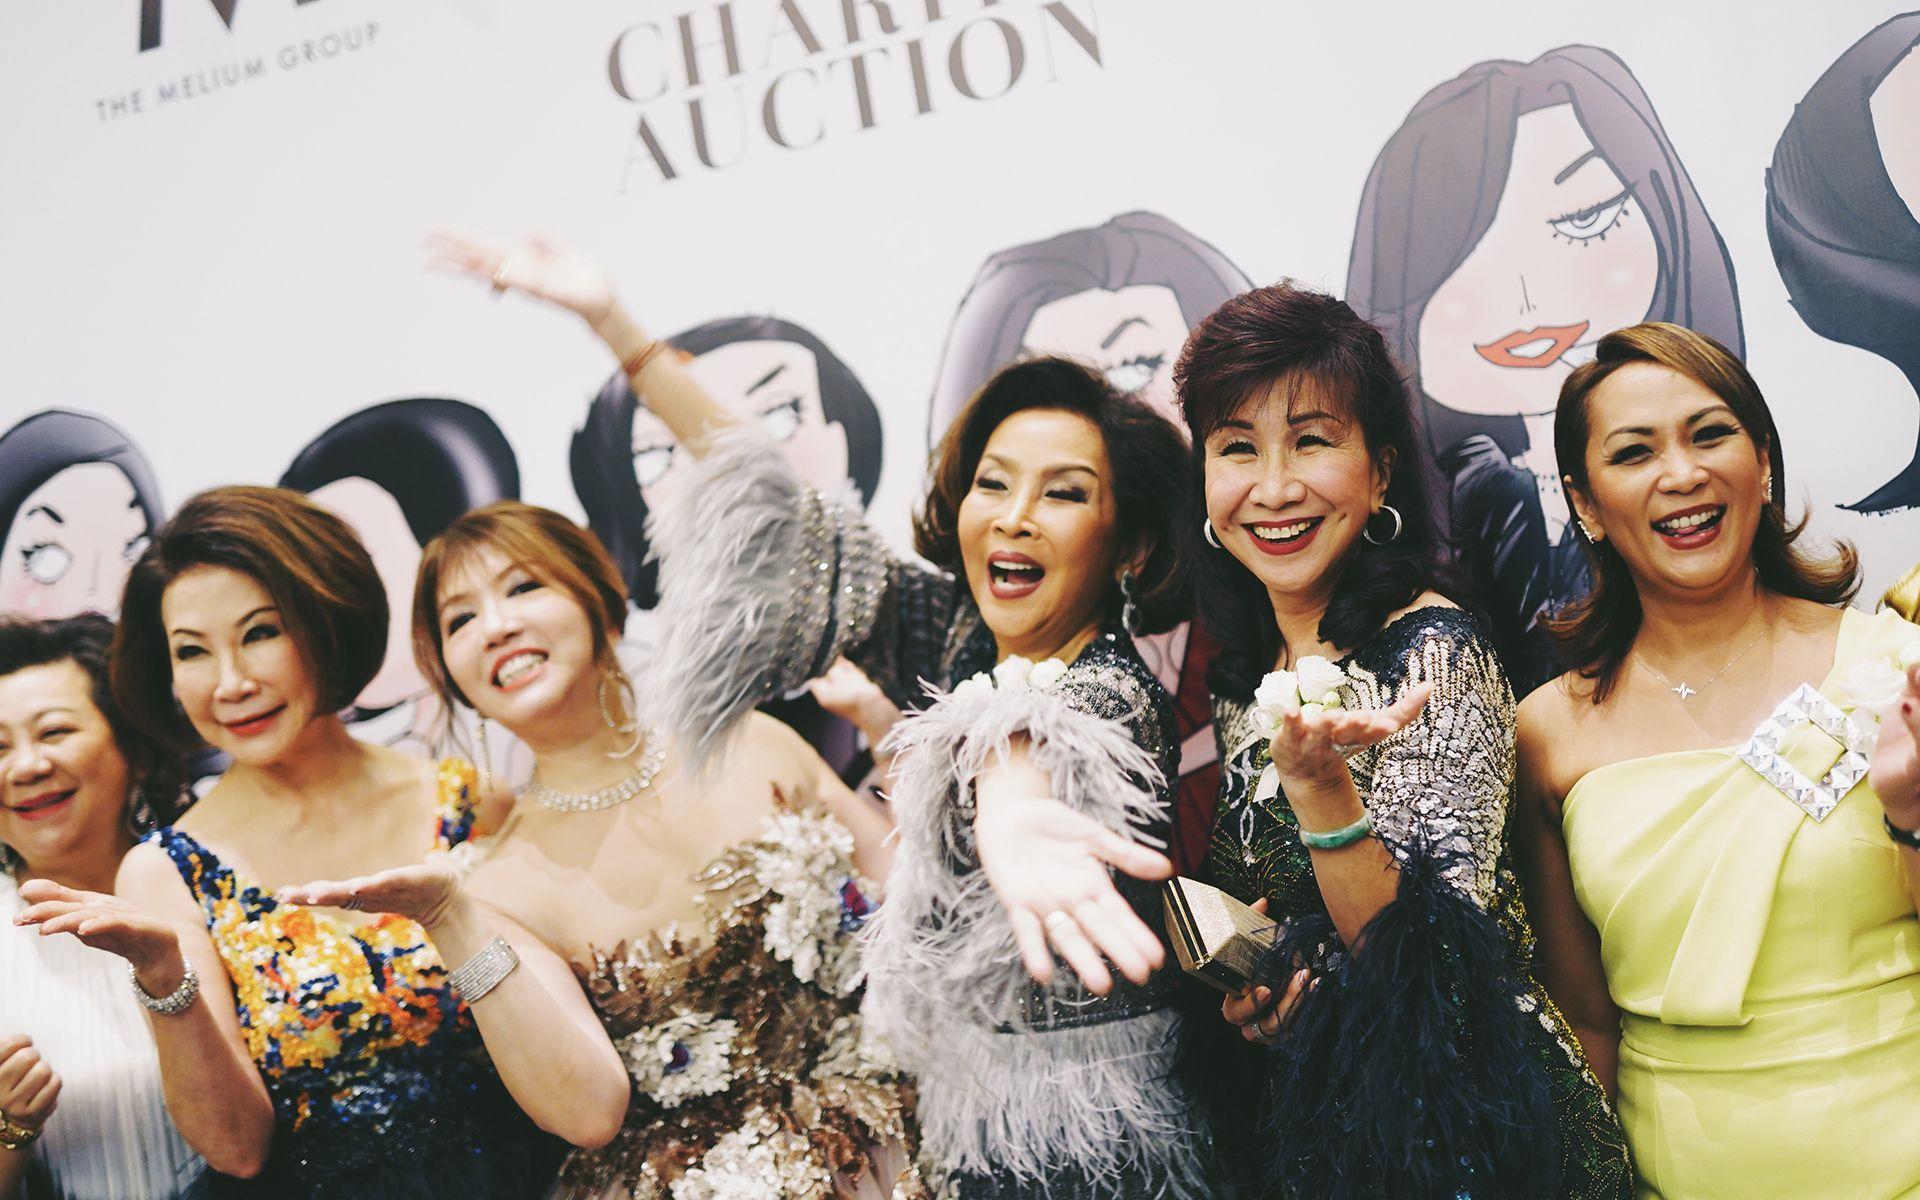 Datin Su Day, Puan Sri Sandra Lee, Lee Jim Leng, Dato' Seri Farah Khan, Florence Fang and Puteri Badrinise Zakuan-Alauddin